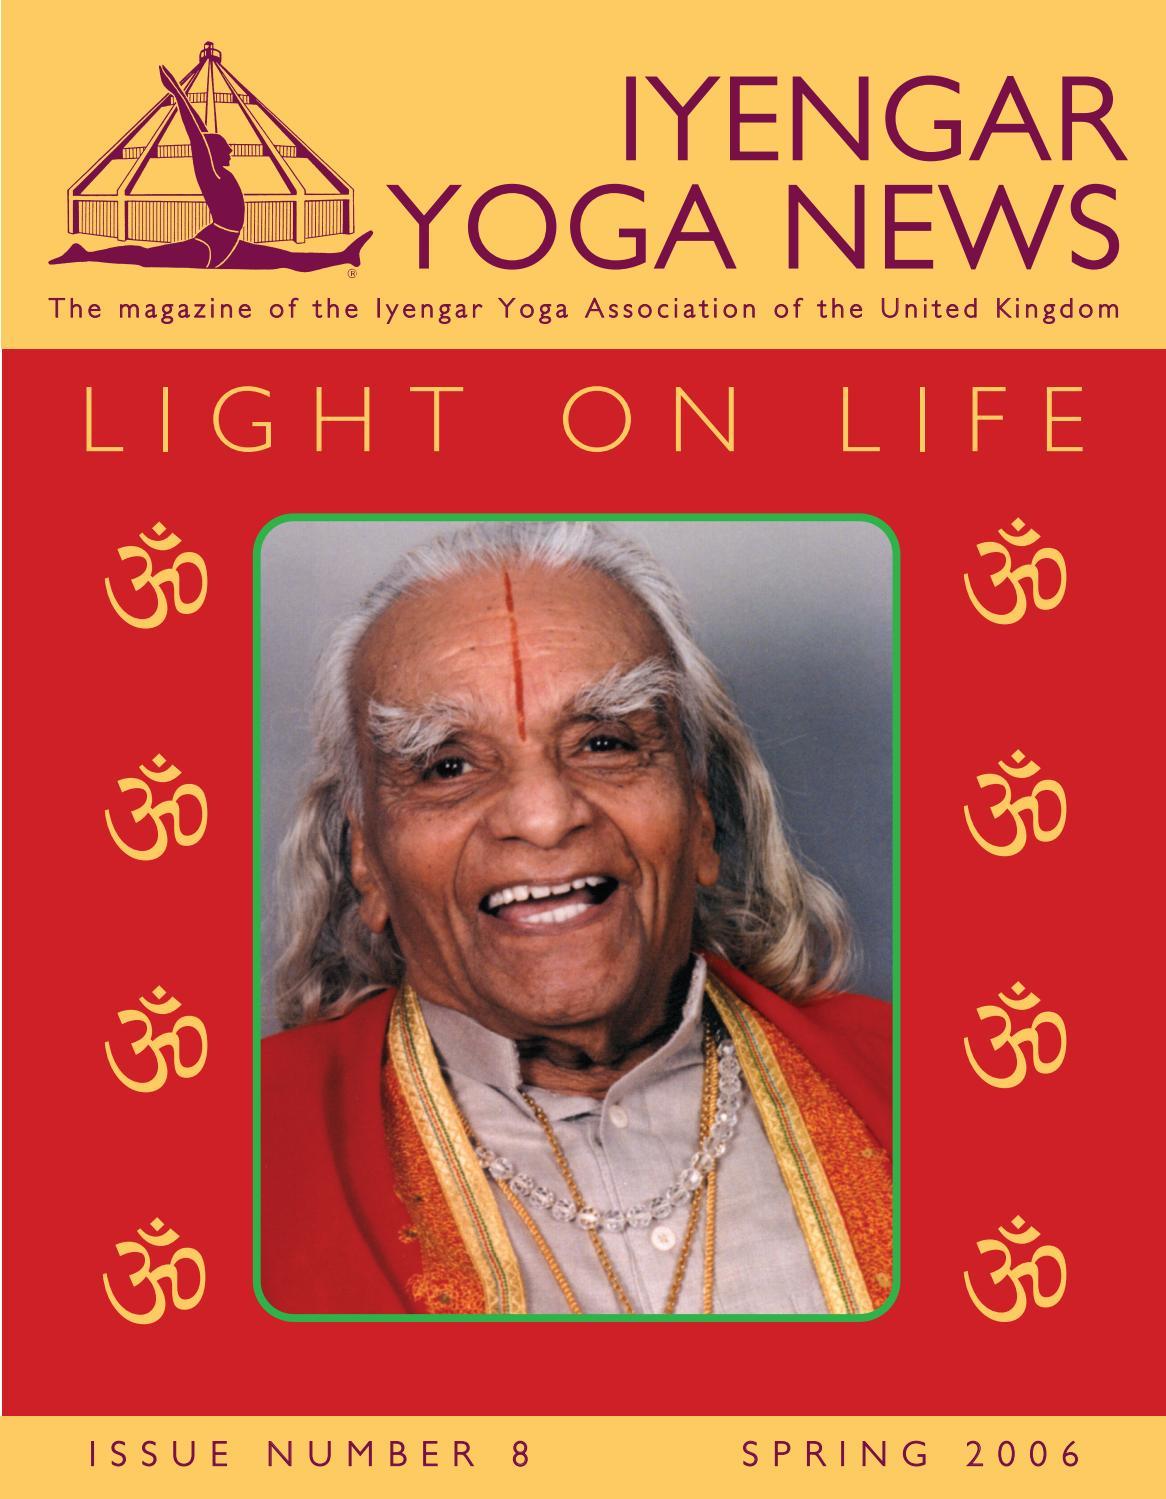 Iyengar Yoga News Issue 8 Spring 2006 By Iyengar Yoga Uk Issuu